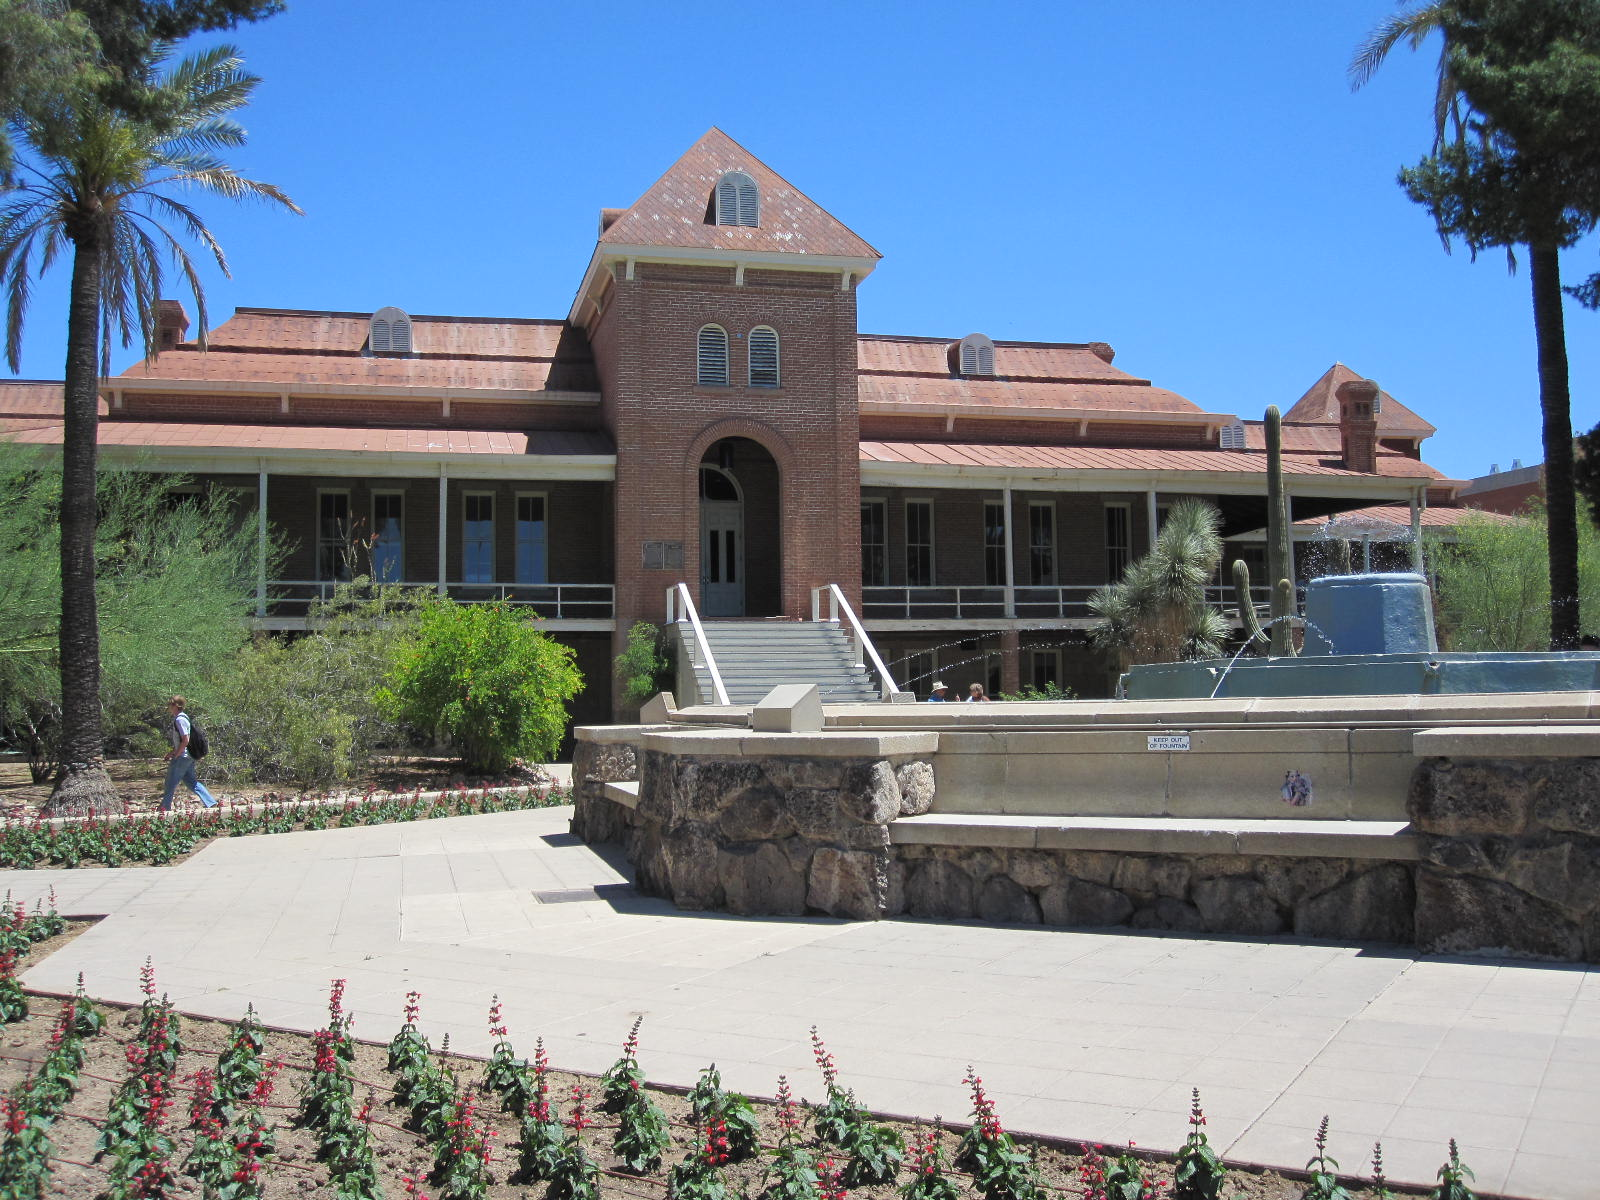 University Of Arizona Campus Wallpaper Old main university of 1600x1200